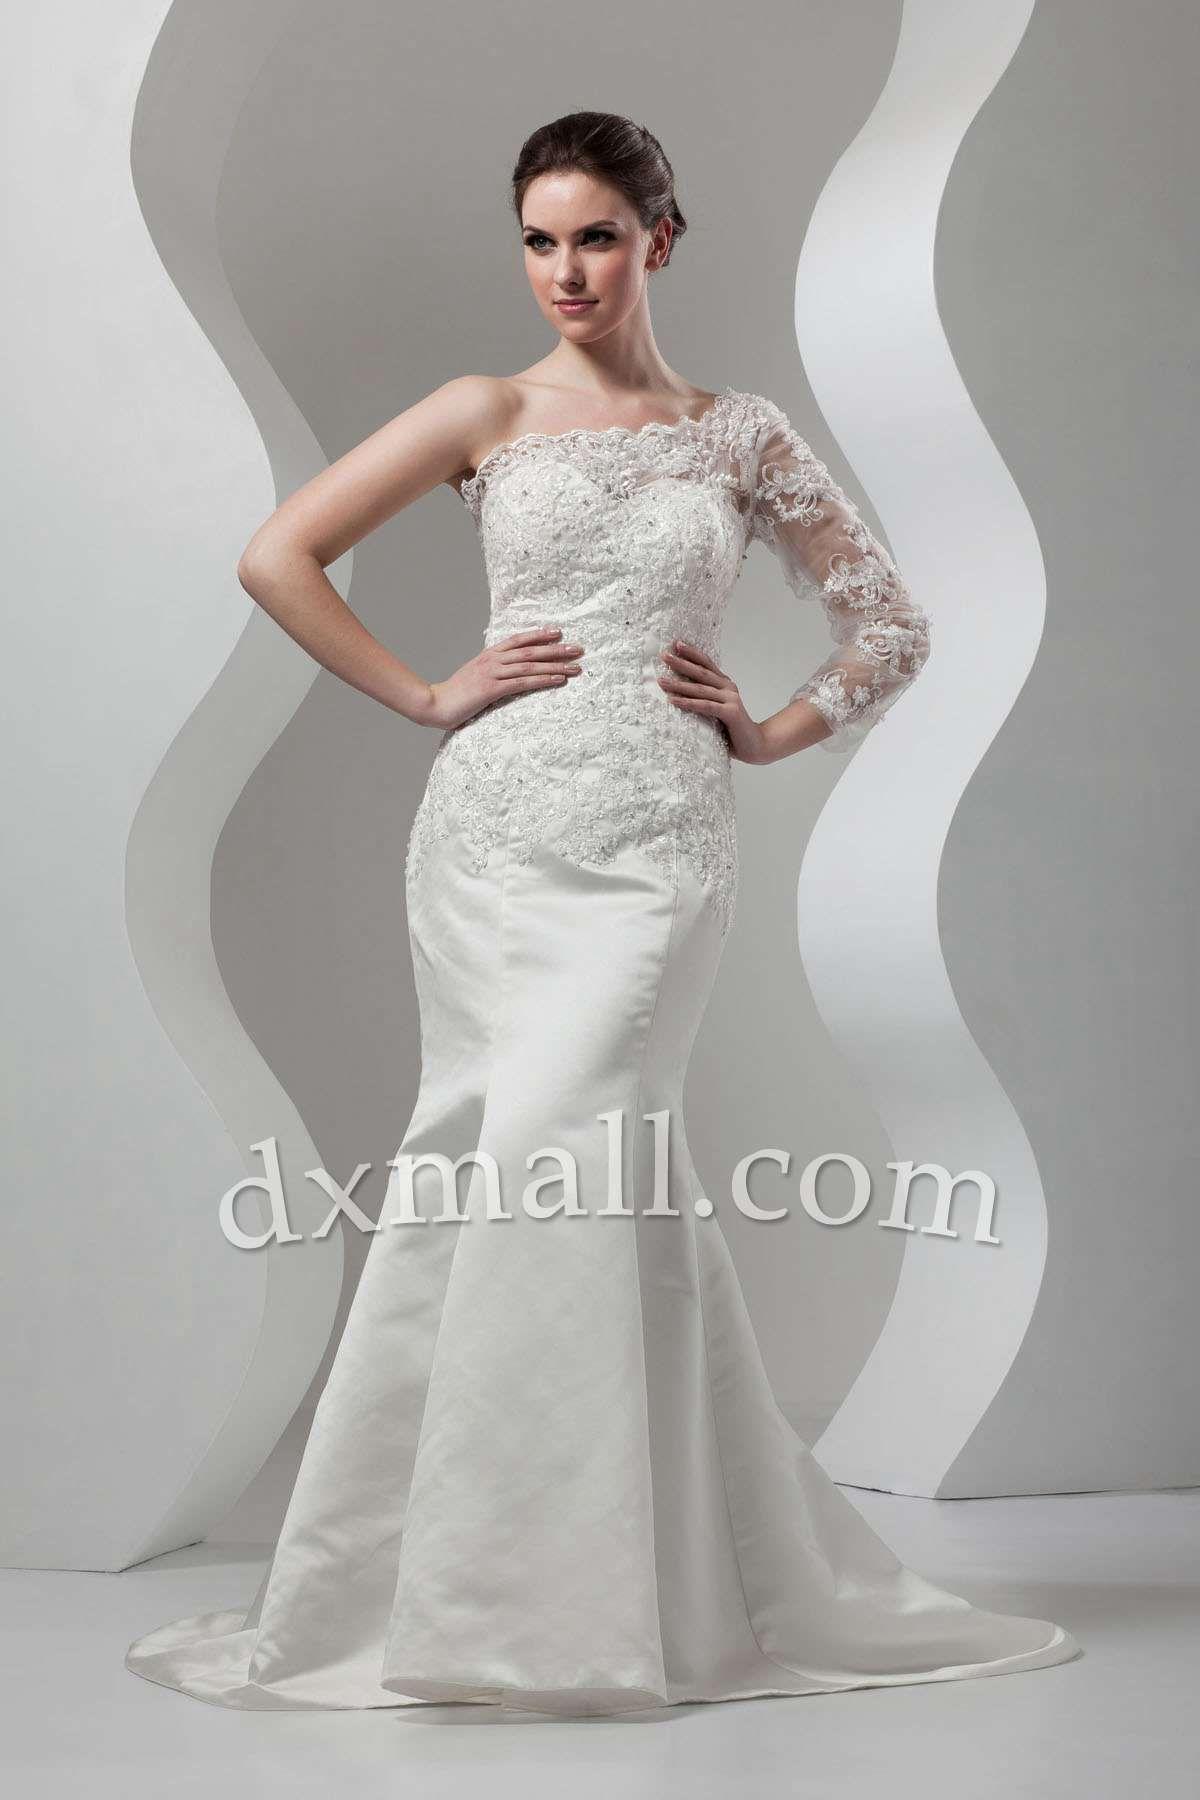 Trumpetmermaid wedding dresses picture shown court train lace